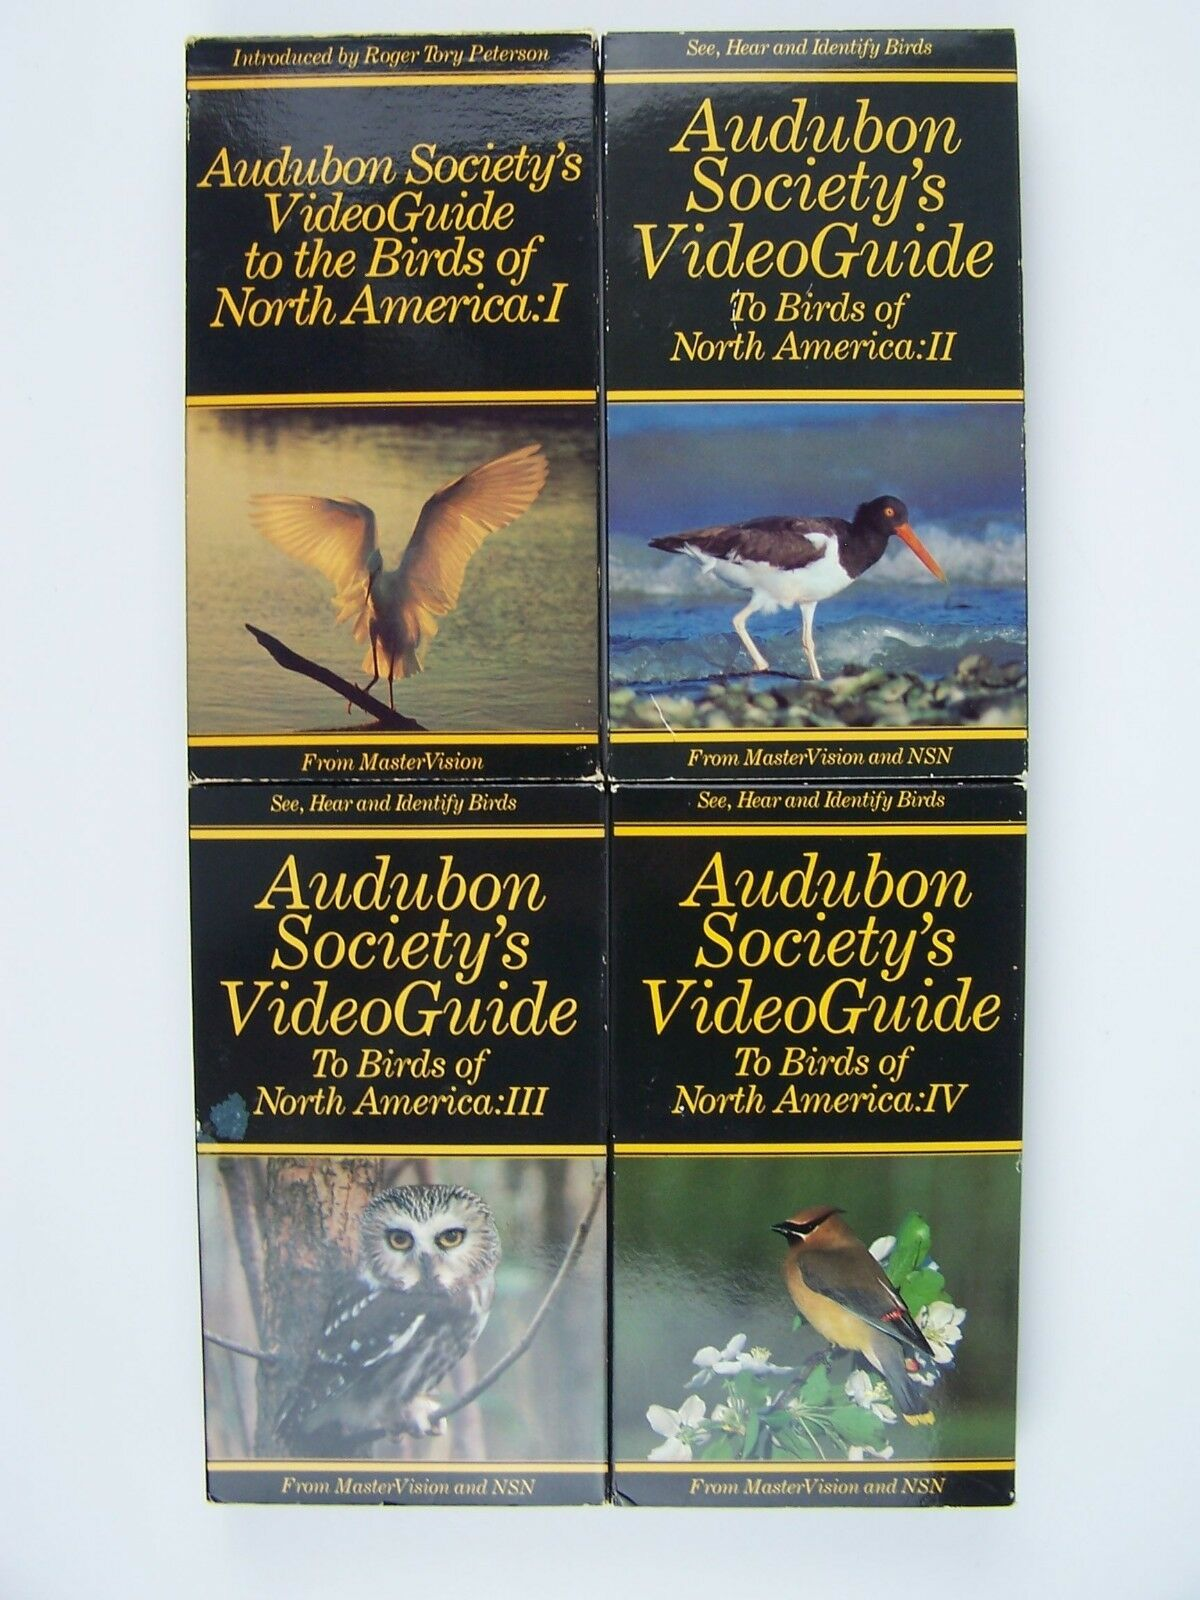 Audubon Society's VideoGuide To Birds of North America